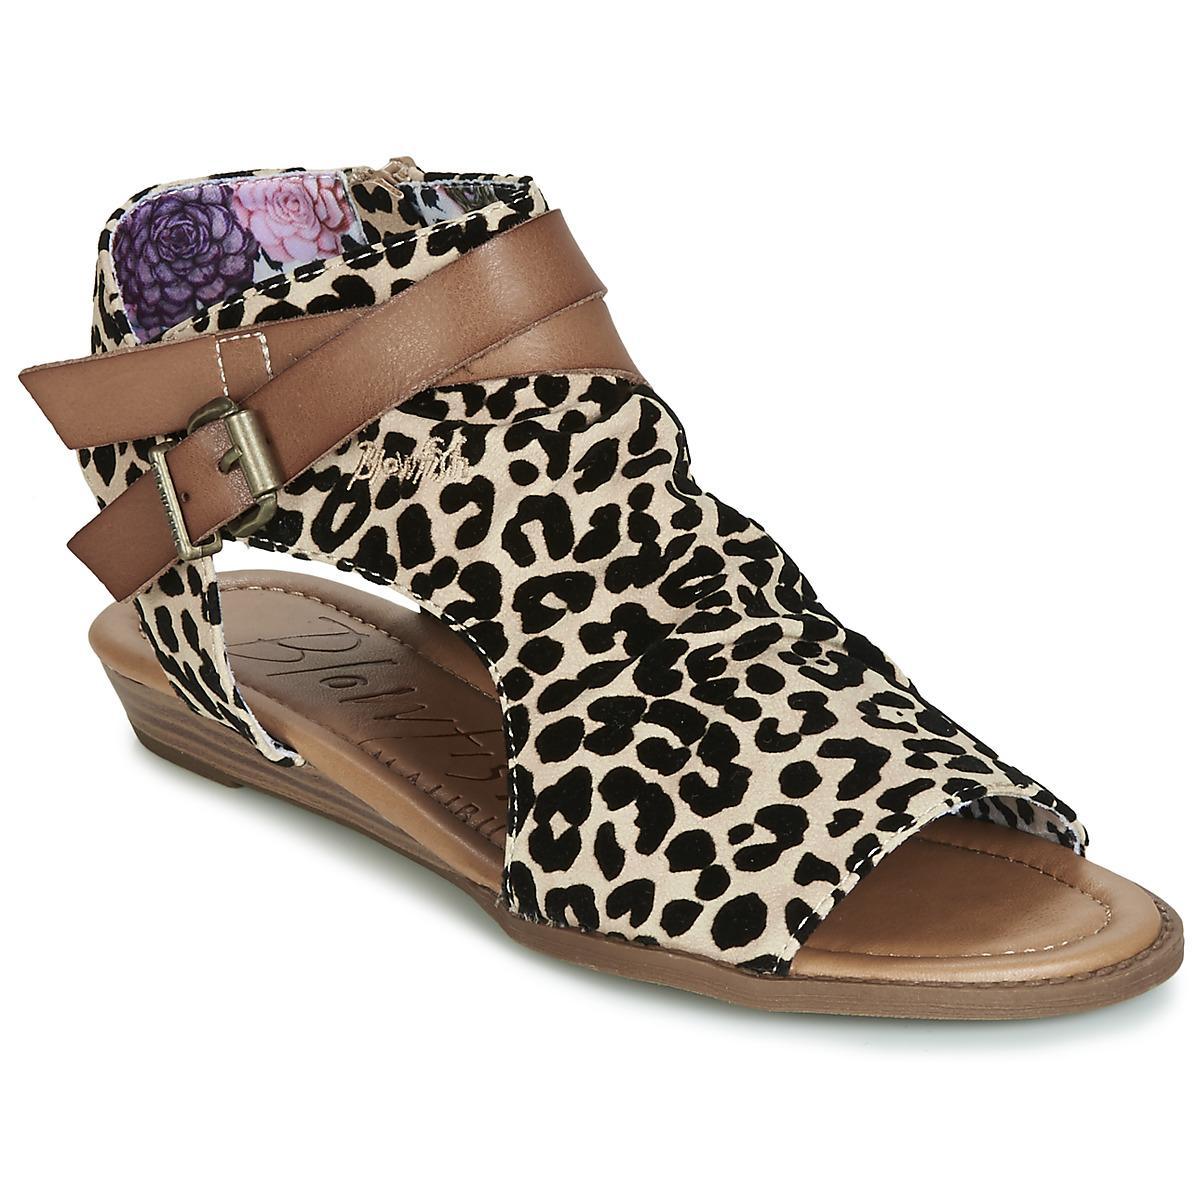 8602e48276f Blowfish Malibu Balla Women s Sandals In Brown in Brown - Lyst